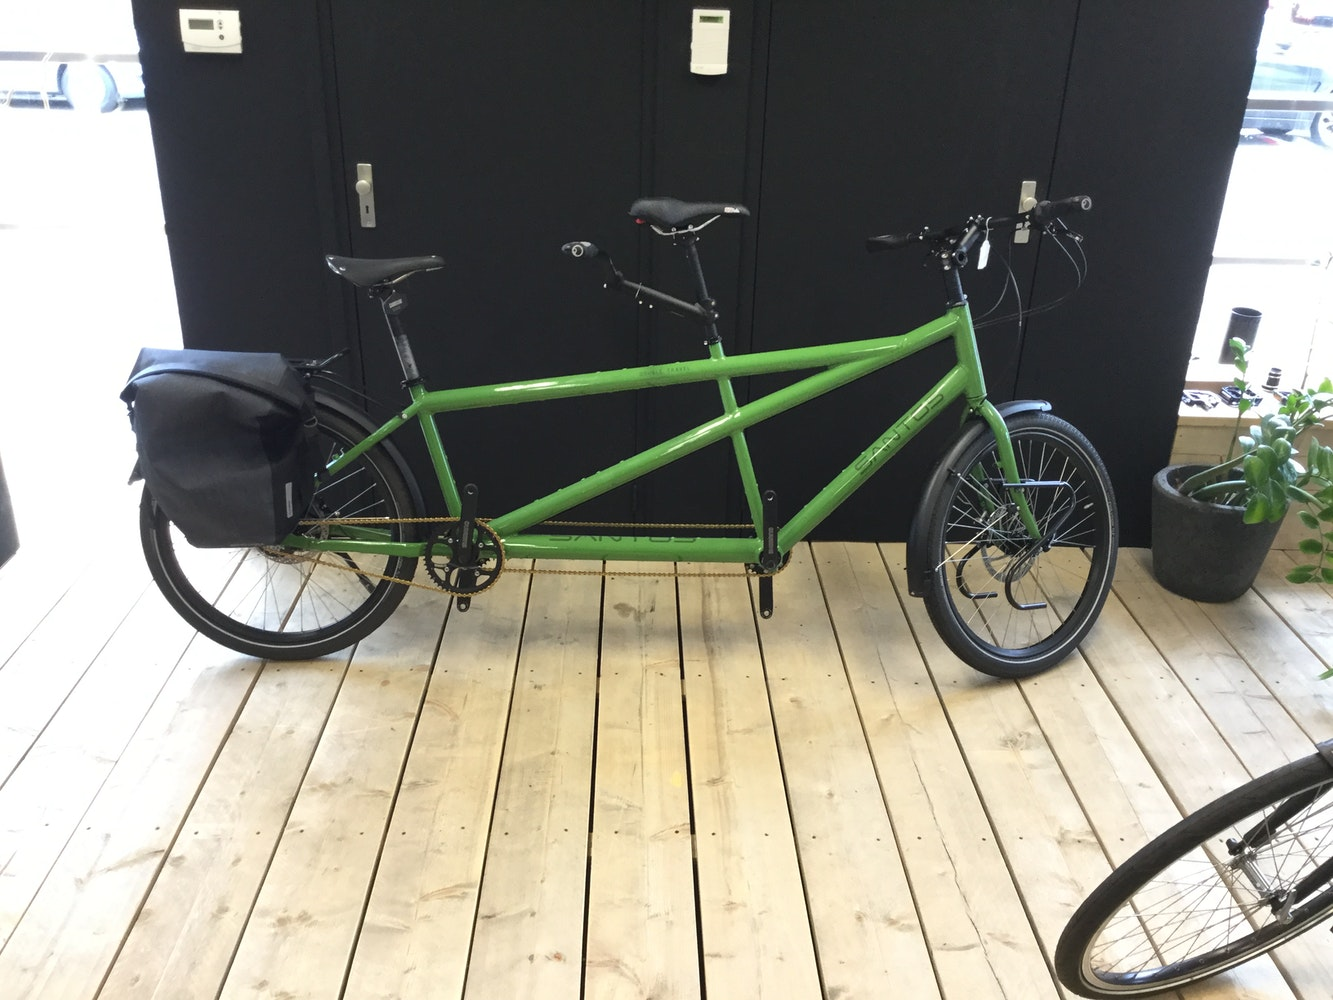 f4e5ed7d9c5 Santos Double travel 2 2018 | 2271157 | BikeExchange.nl